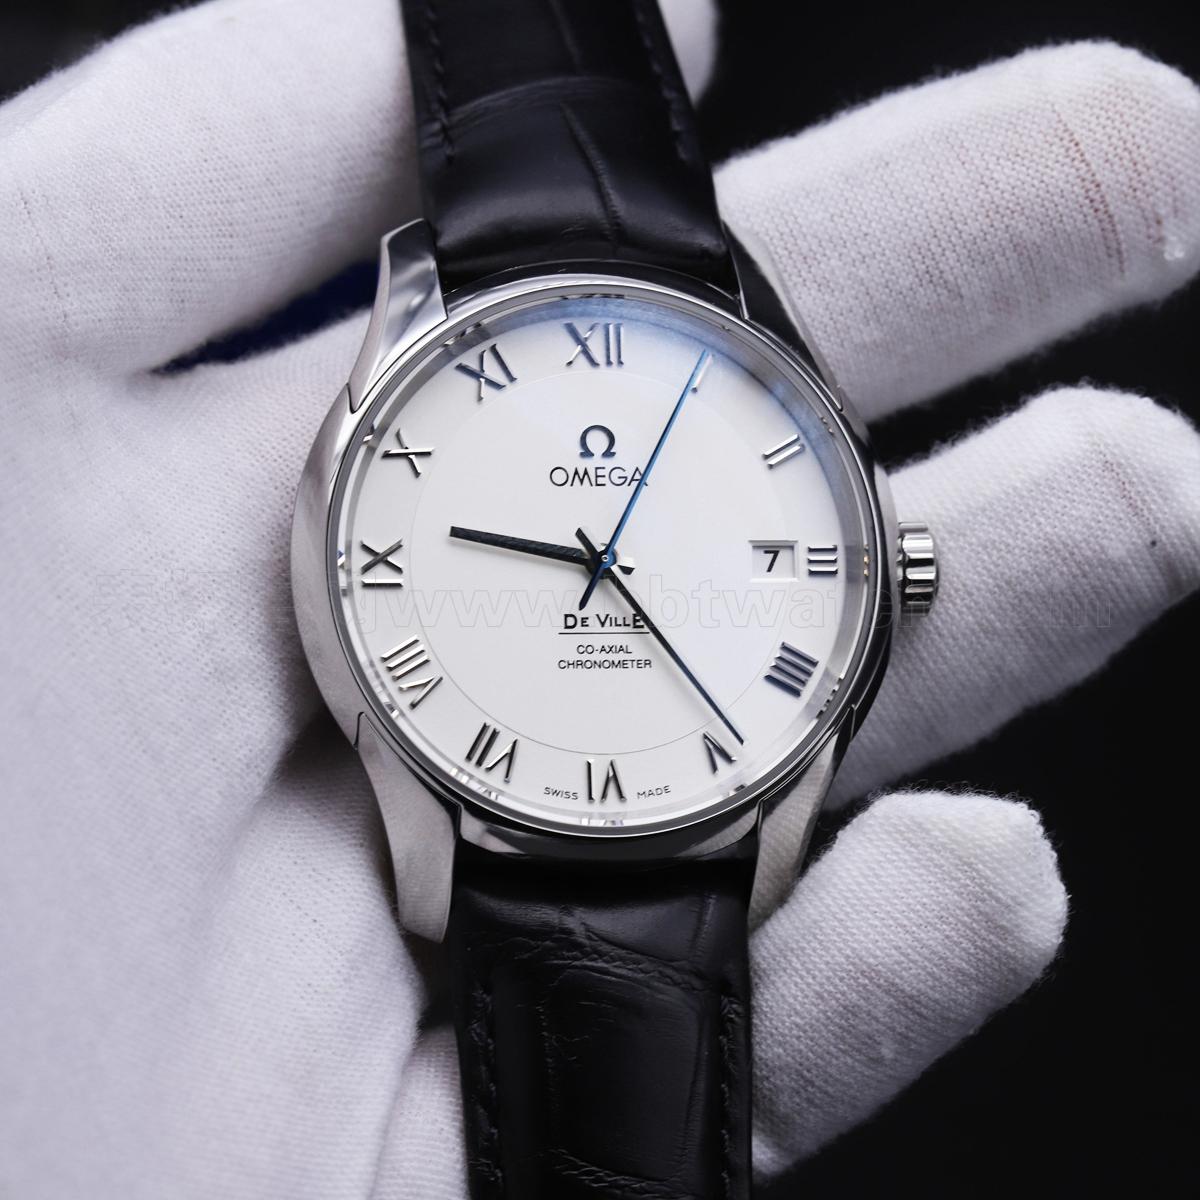 vs欧米茄碟飞系列8500机芯怎么样 复刻表评测——典雅大方经典风范男士手表